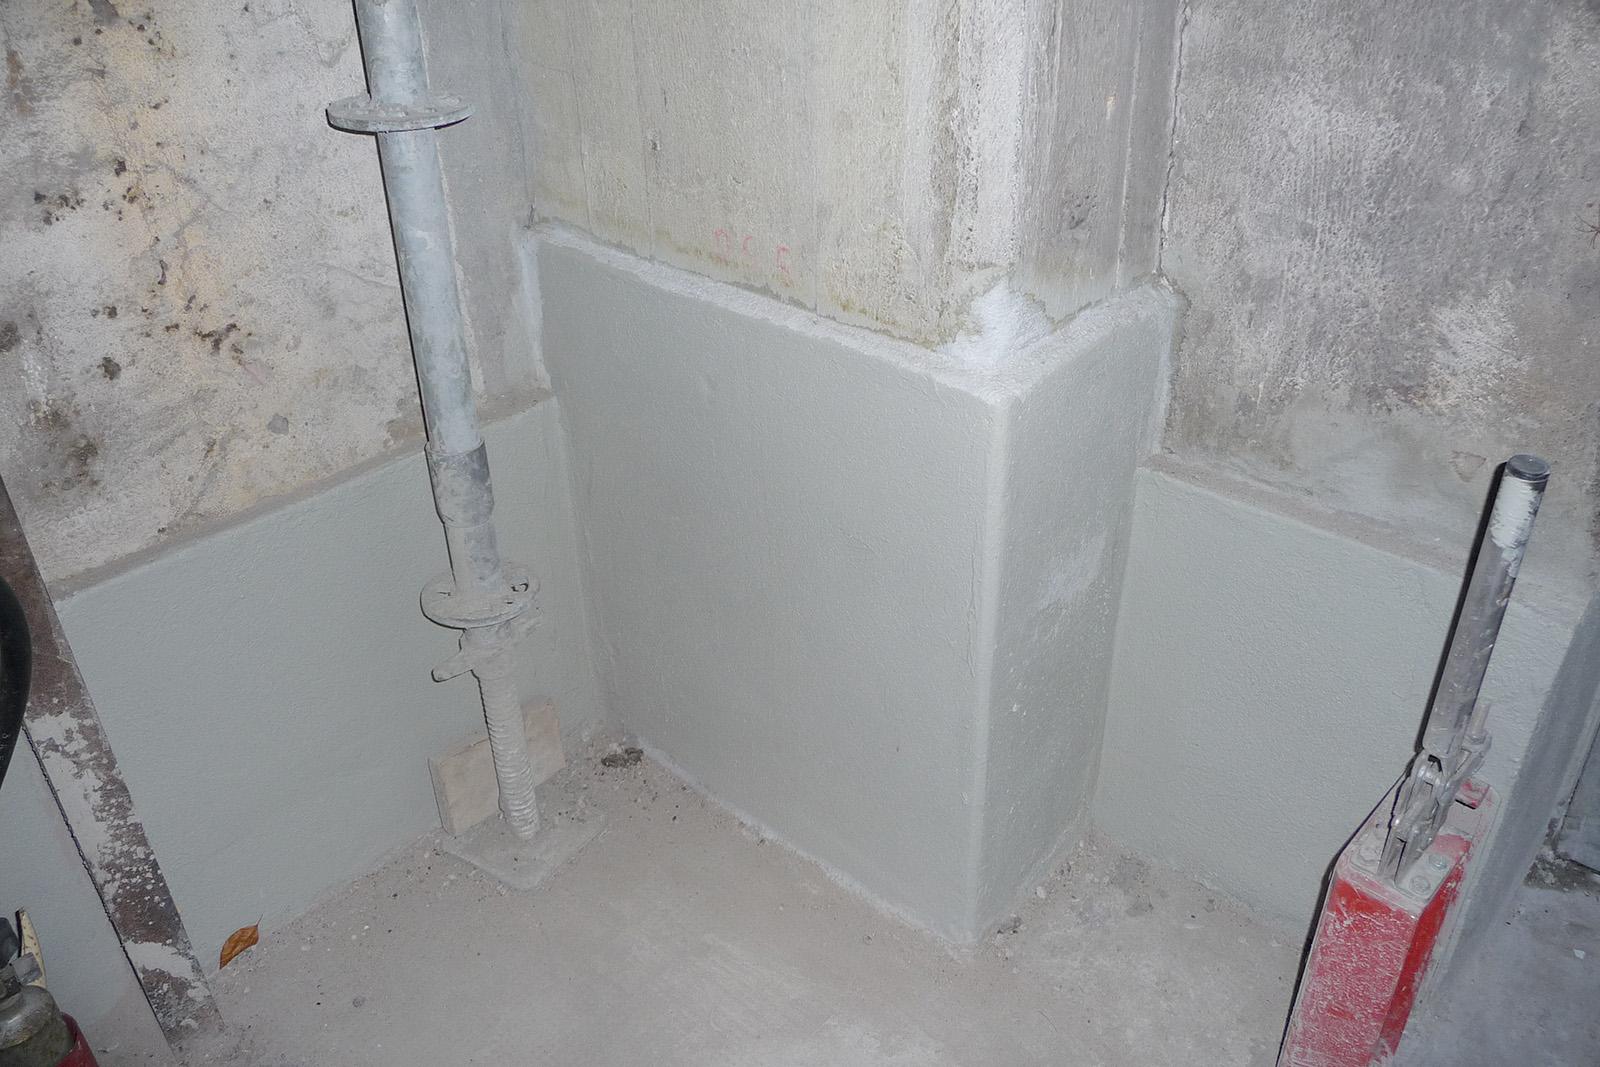 Instandsetzung Sockelbereich · Rütgers Castrop-Rauxel